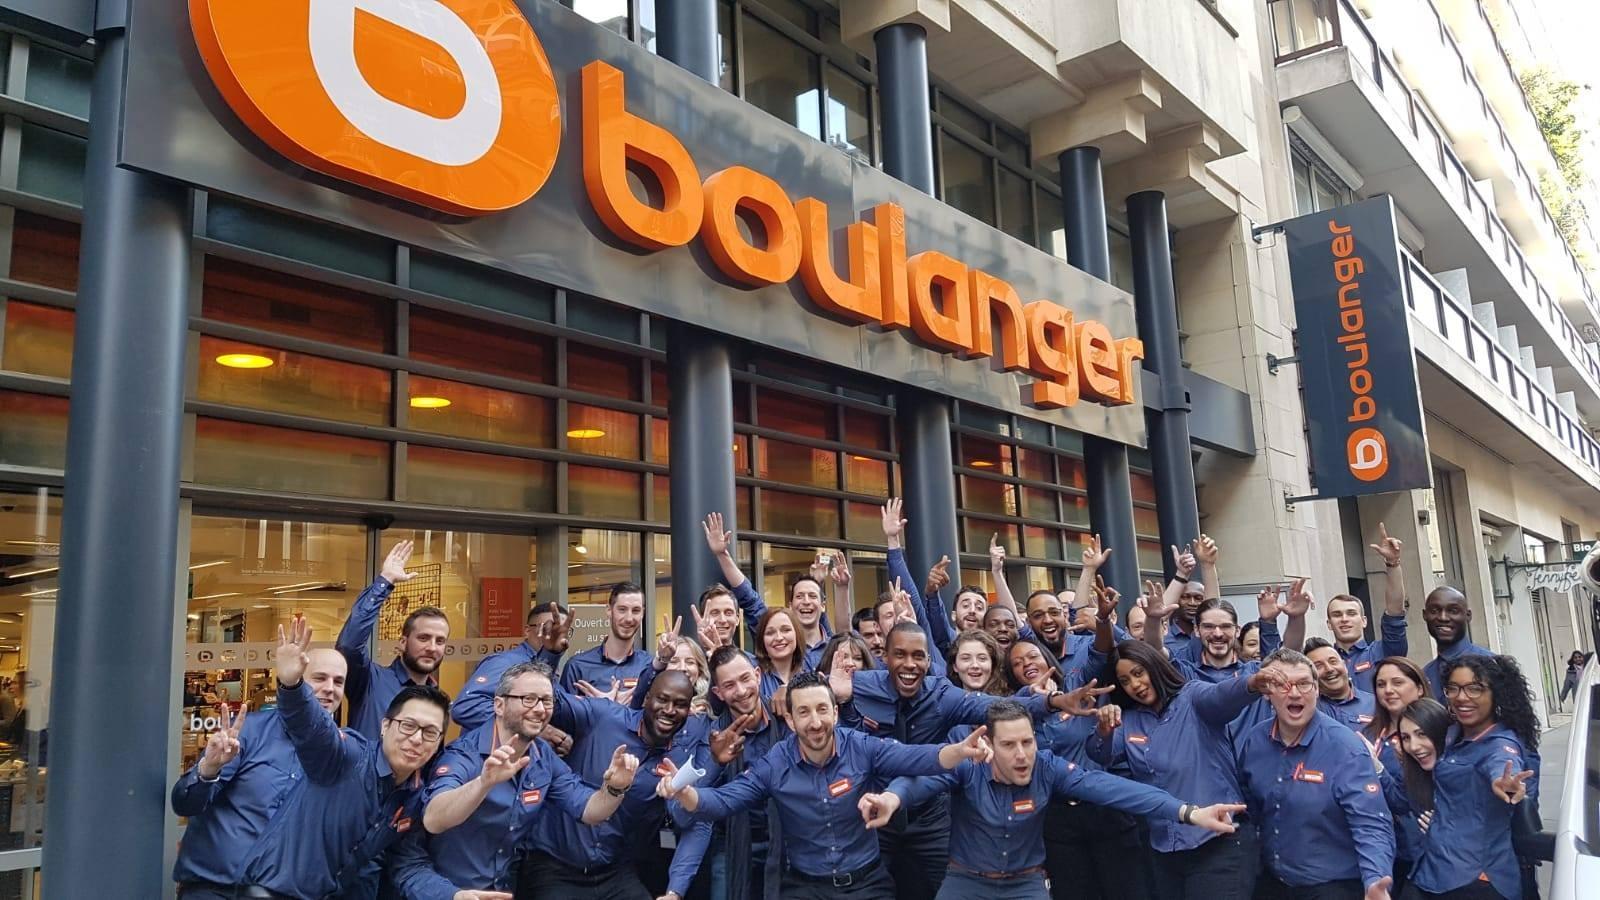 Boulanger Paris Passy